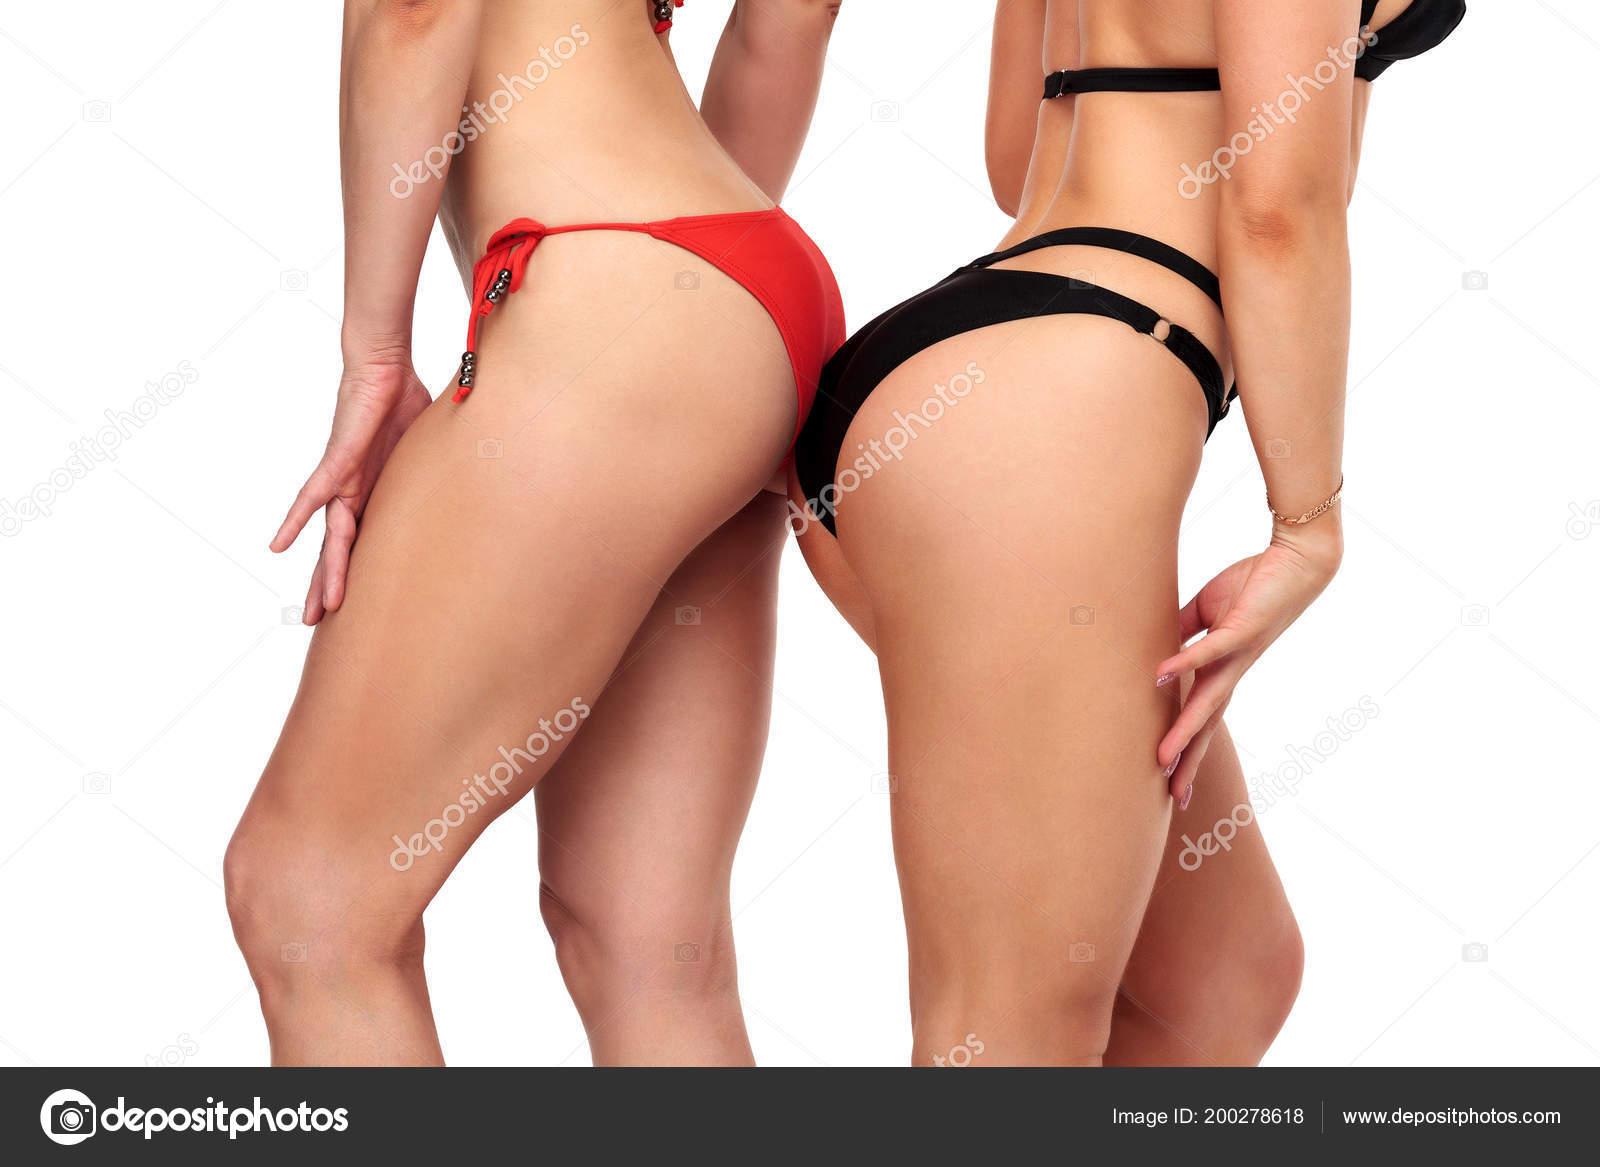 Bikini Están Dos Negro Fondo Mujeres Sobre Sexy Rojo Posando lKJc3u1TF